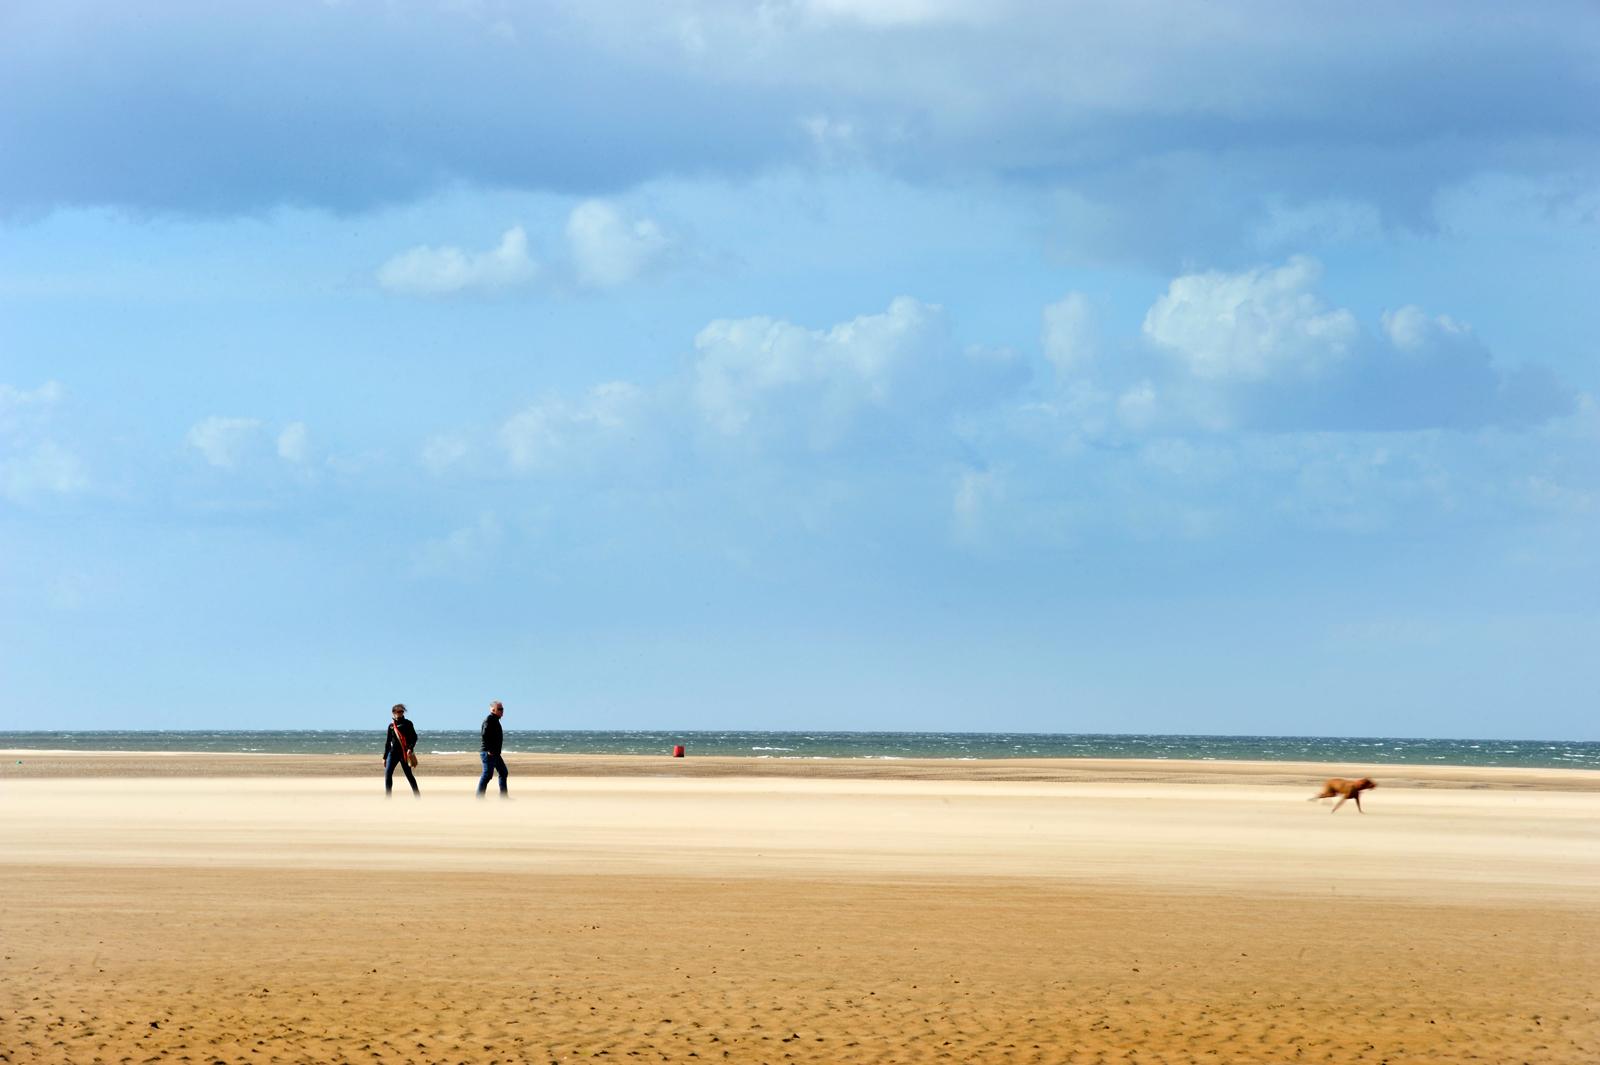 A couple walking their dog on the beach near Burnham Overy Staithe, Norfolk, UK